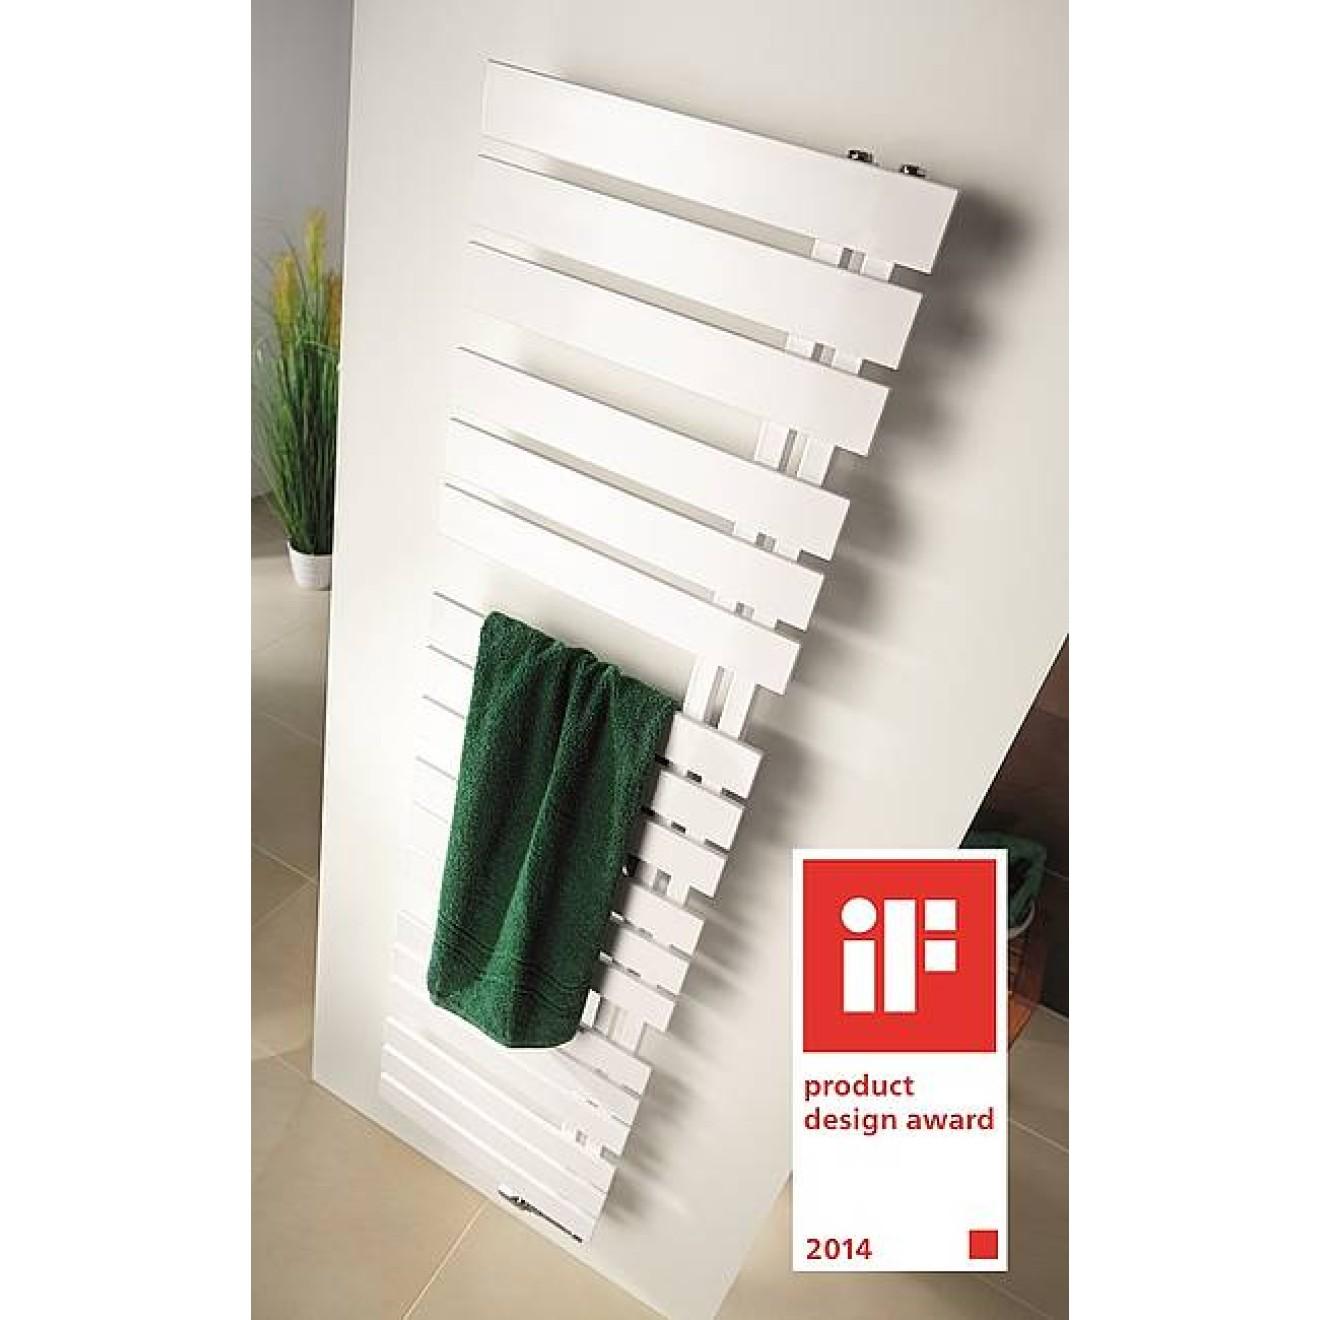 badheizk rper yenga 600 x 1200 mm mittelanschluss treffpunkt bad der shop f r das moderne bad. Black Bedroom Furniture Sets. Home Design Ideas